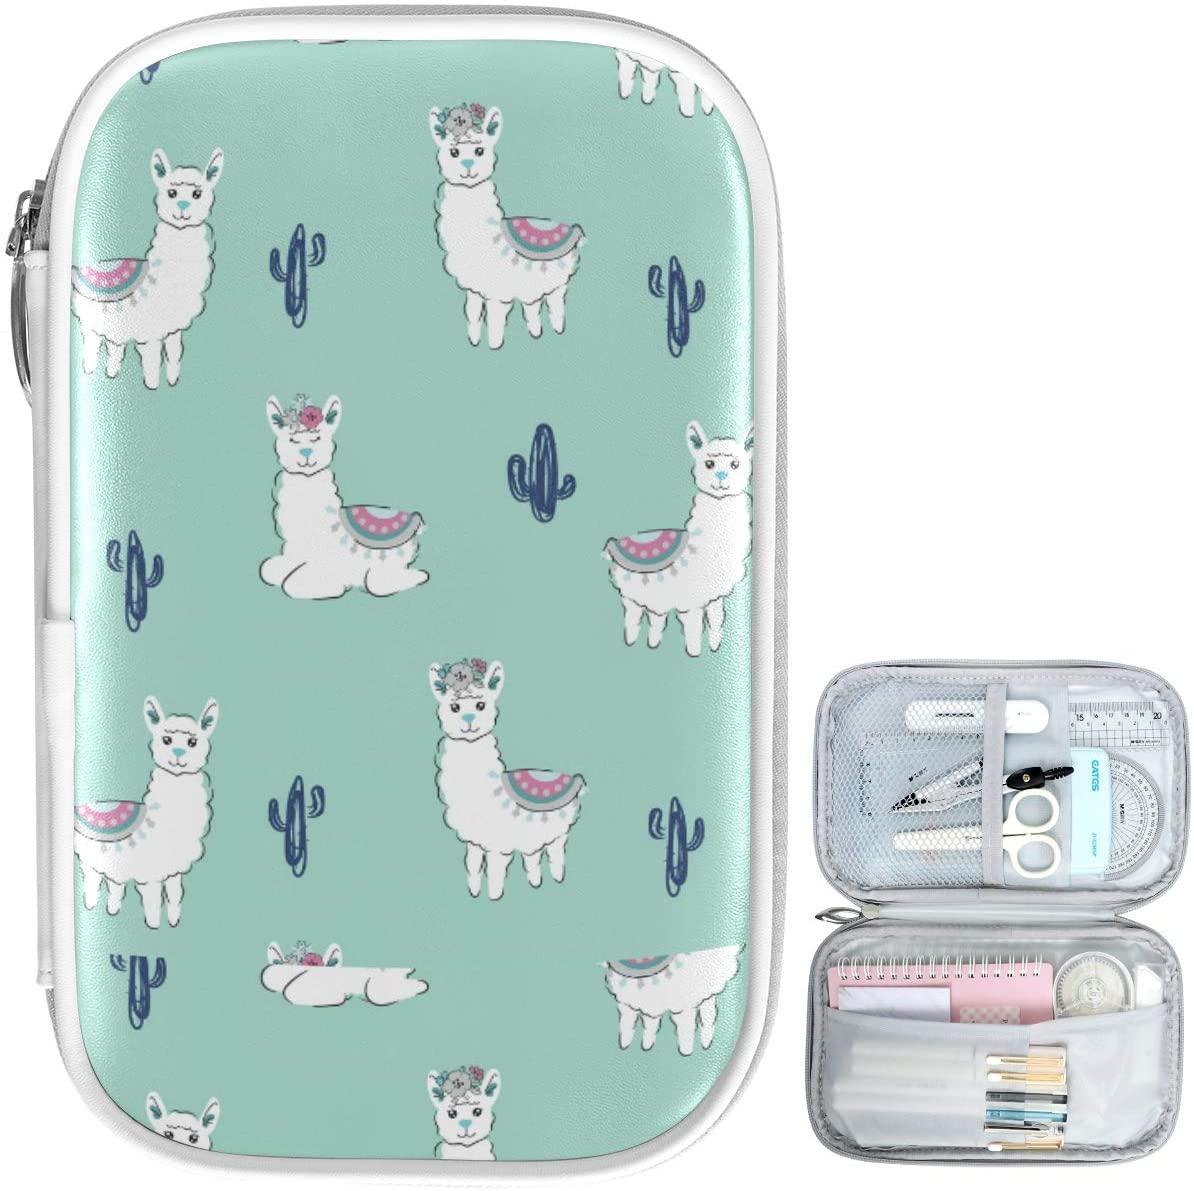 Oarencol Cute Llama Cactus Floral Pencil Case Animal Alpaca Flower Zipper Pen Bag Large Capacity Cosmetic Pouch Stationery Box